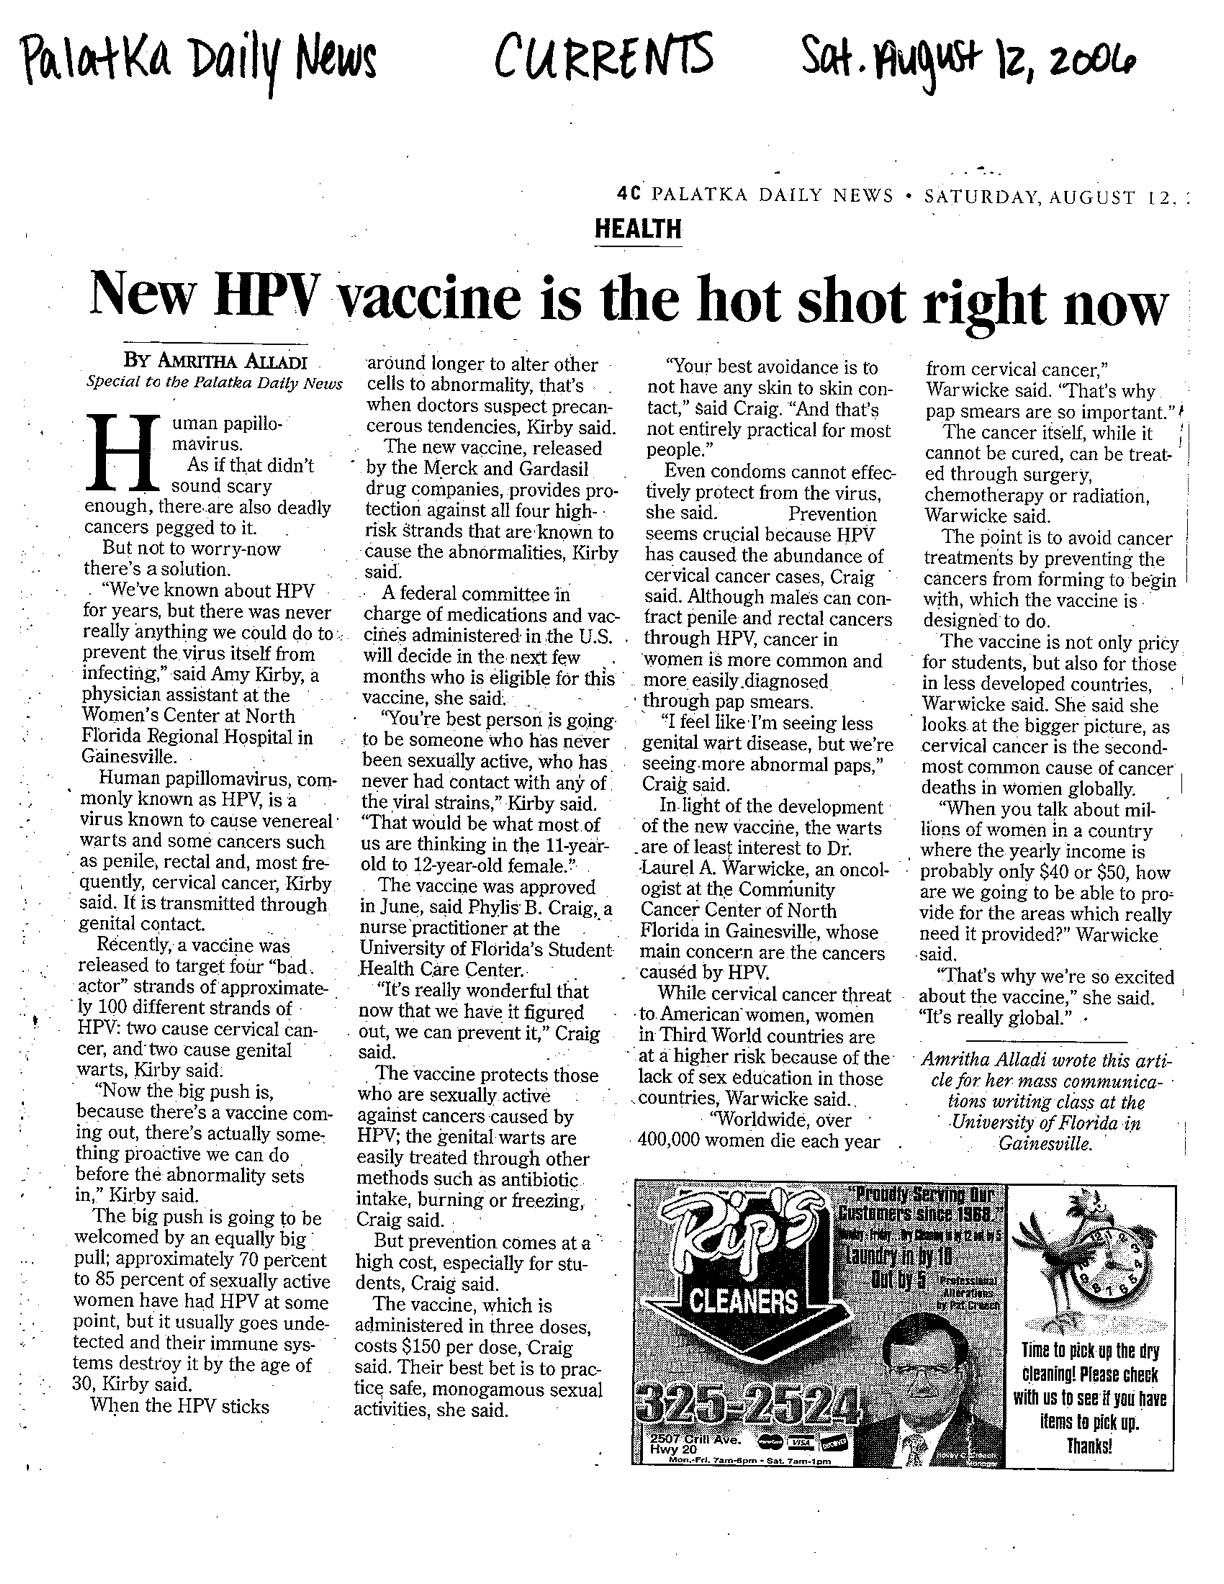 HPV vaccine